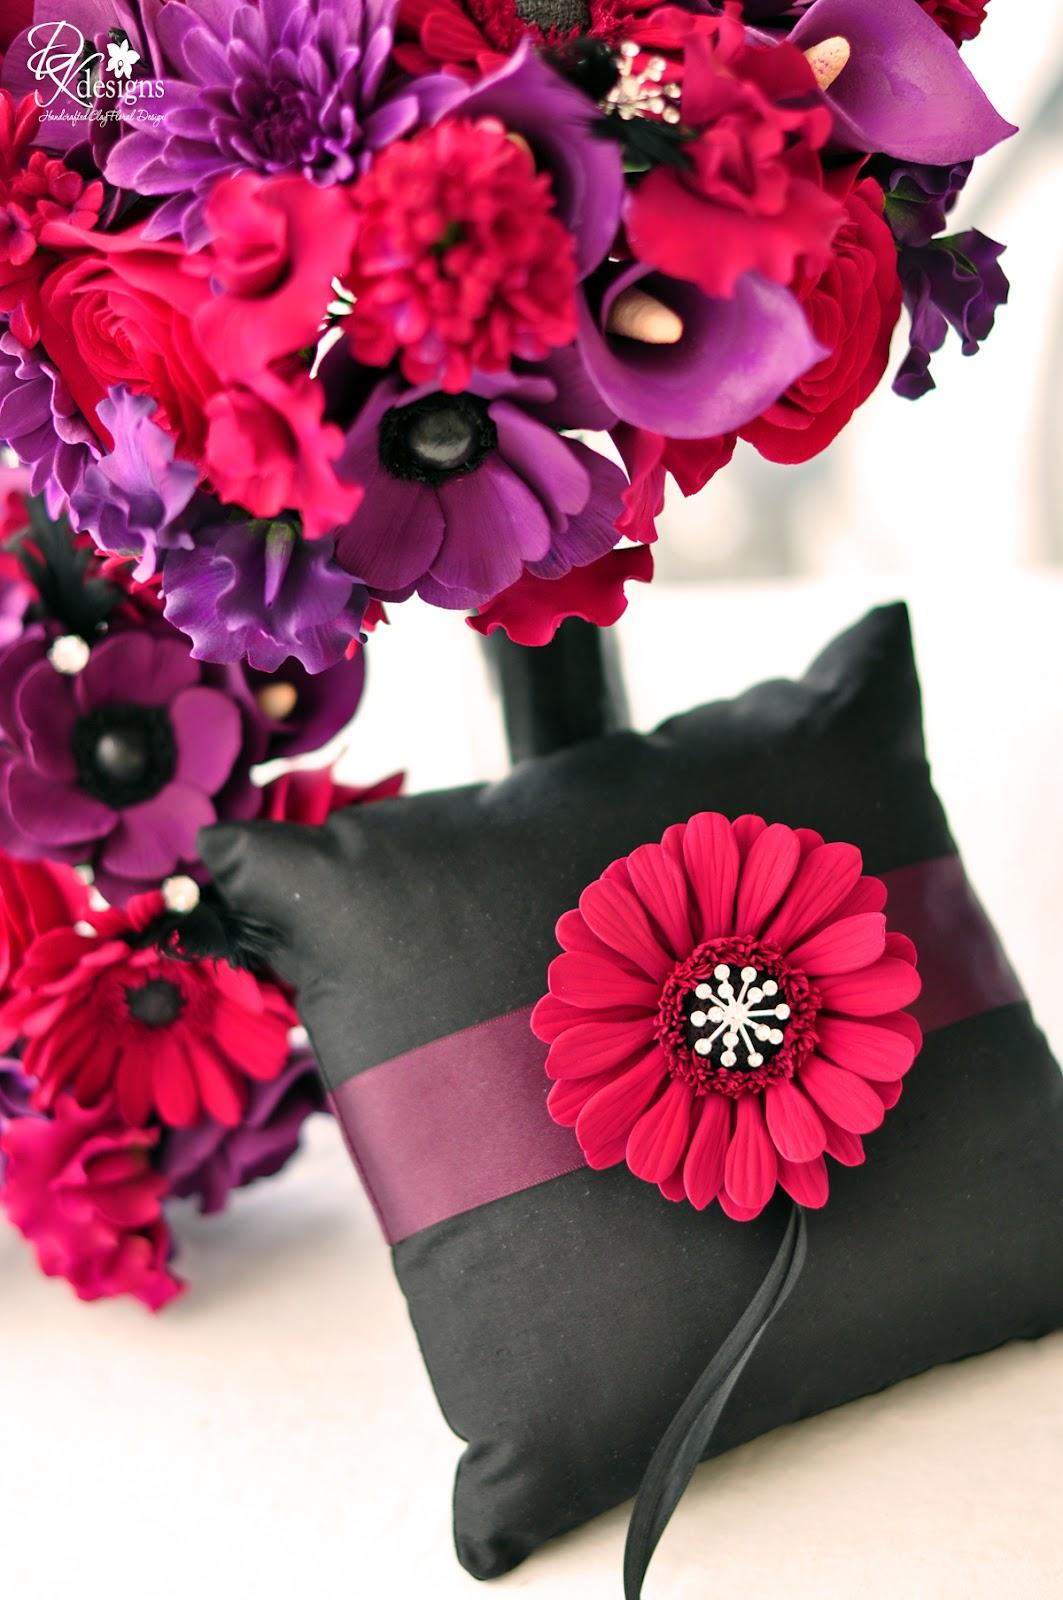 DK Designs 1920s Vintage Glam Inspired Wedding Flowers